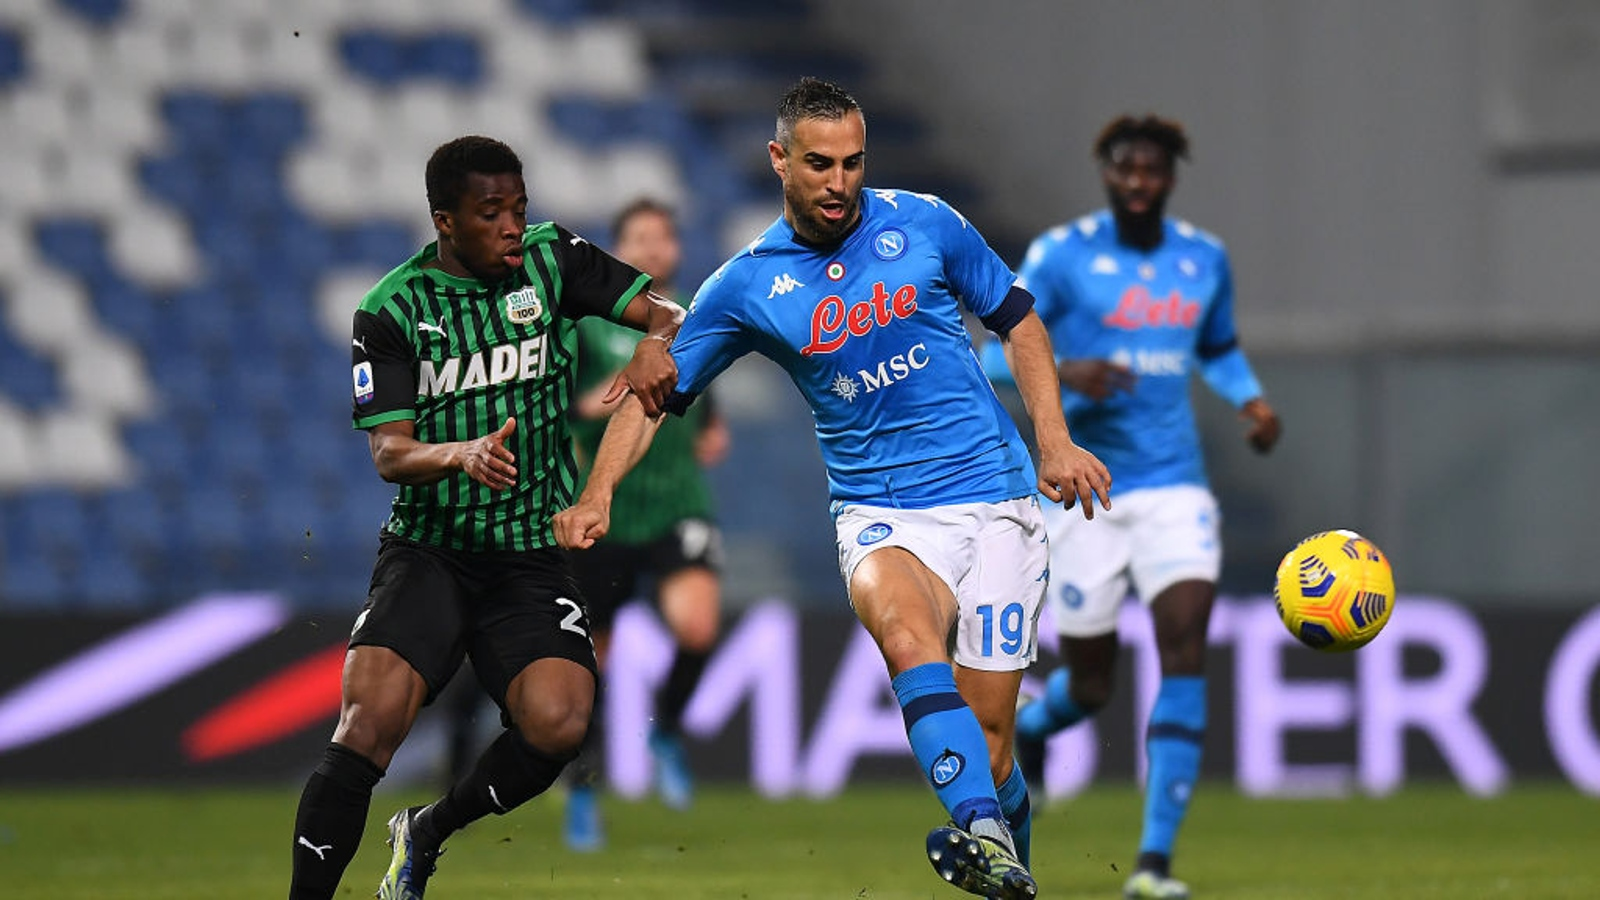 Sassuolo - Napoli 3-3 - Calcio - Rai Sport